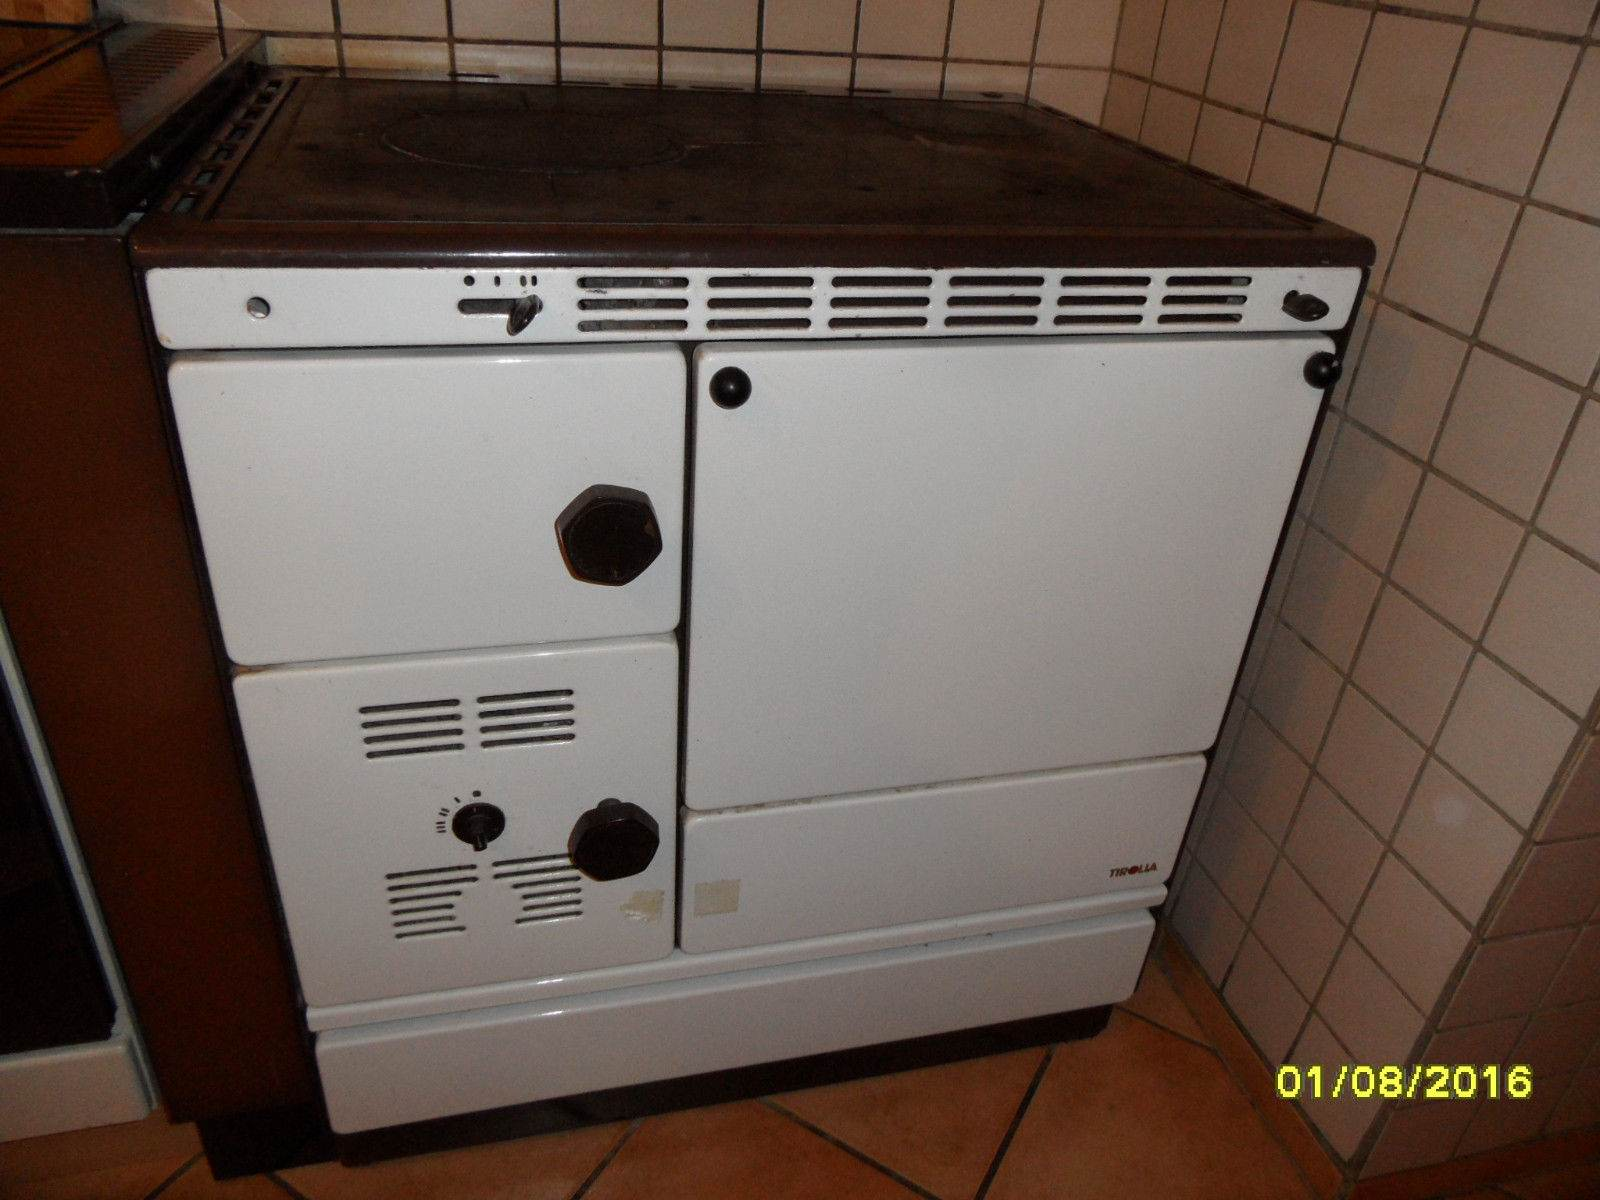 rocket stove cookstove hybrid rocket stoves forum at permies. Black Bedroom Furniture Sets. Home Design Ideas